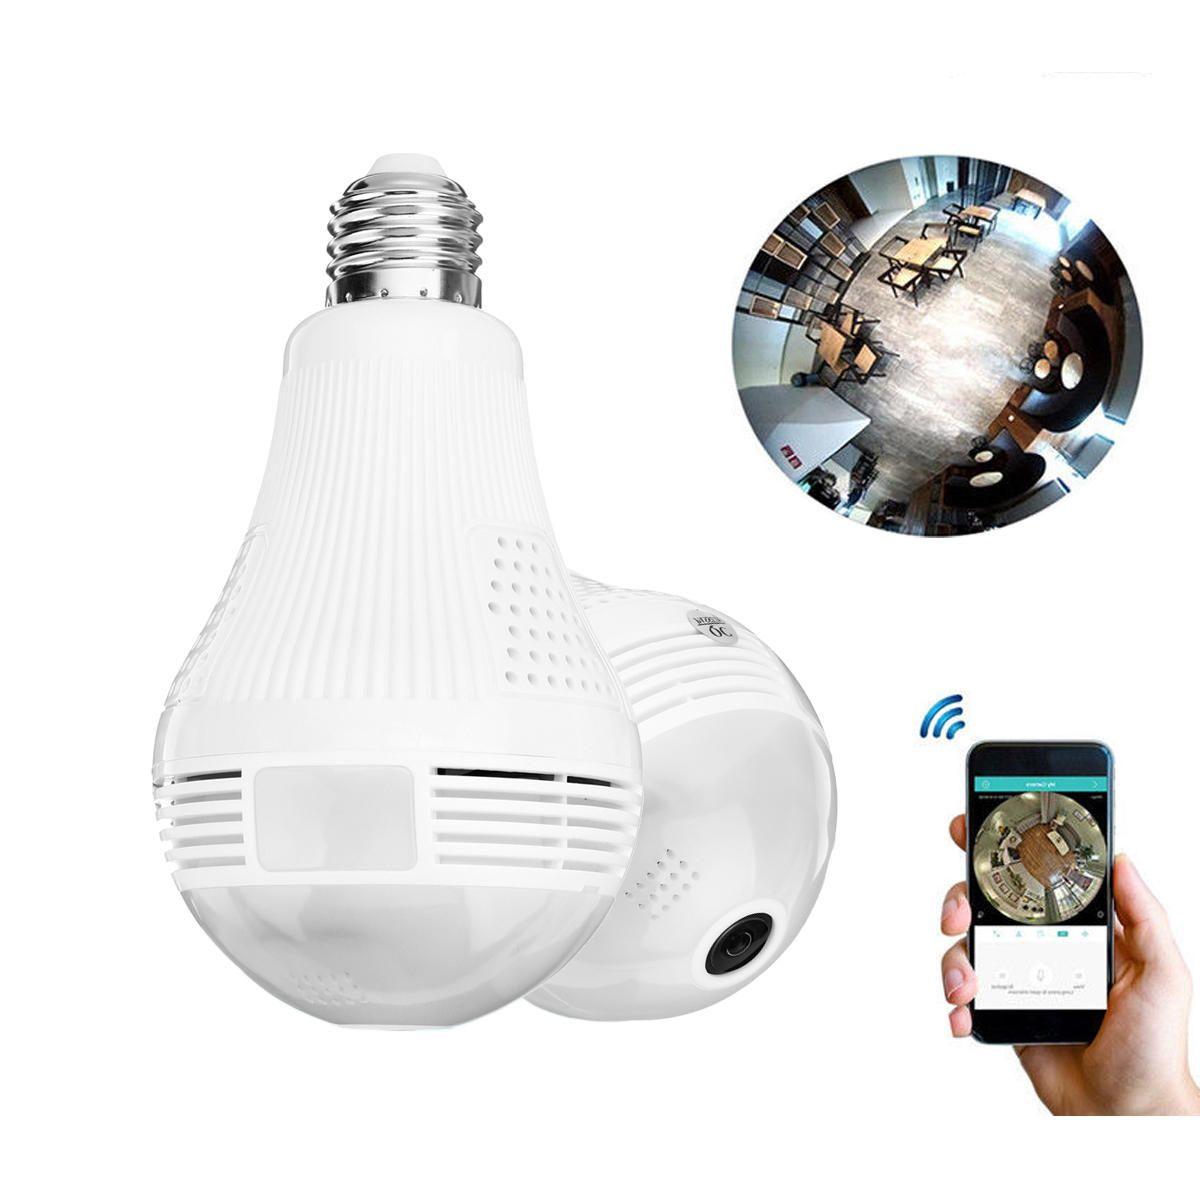 2 in 1 Panoramic 1080P 200W Wifi Camera Light Bulb Cameara Night Vision Two Way Audio